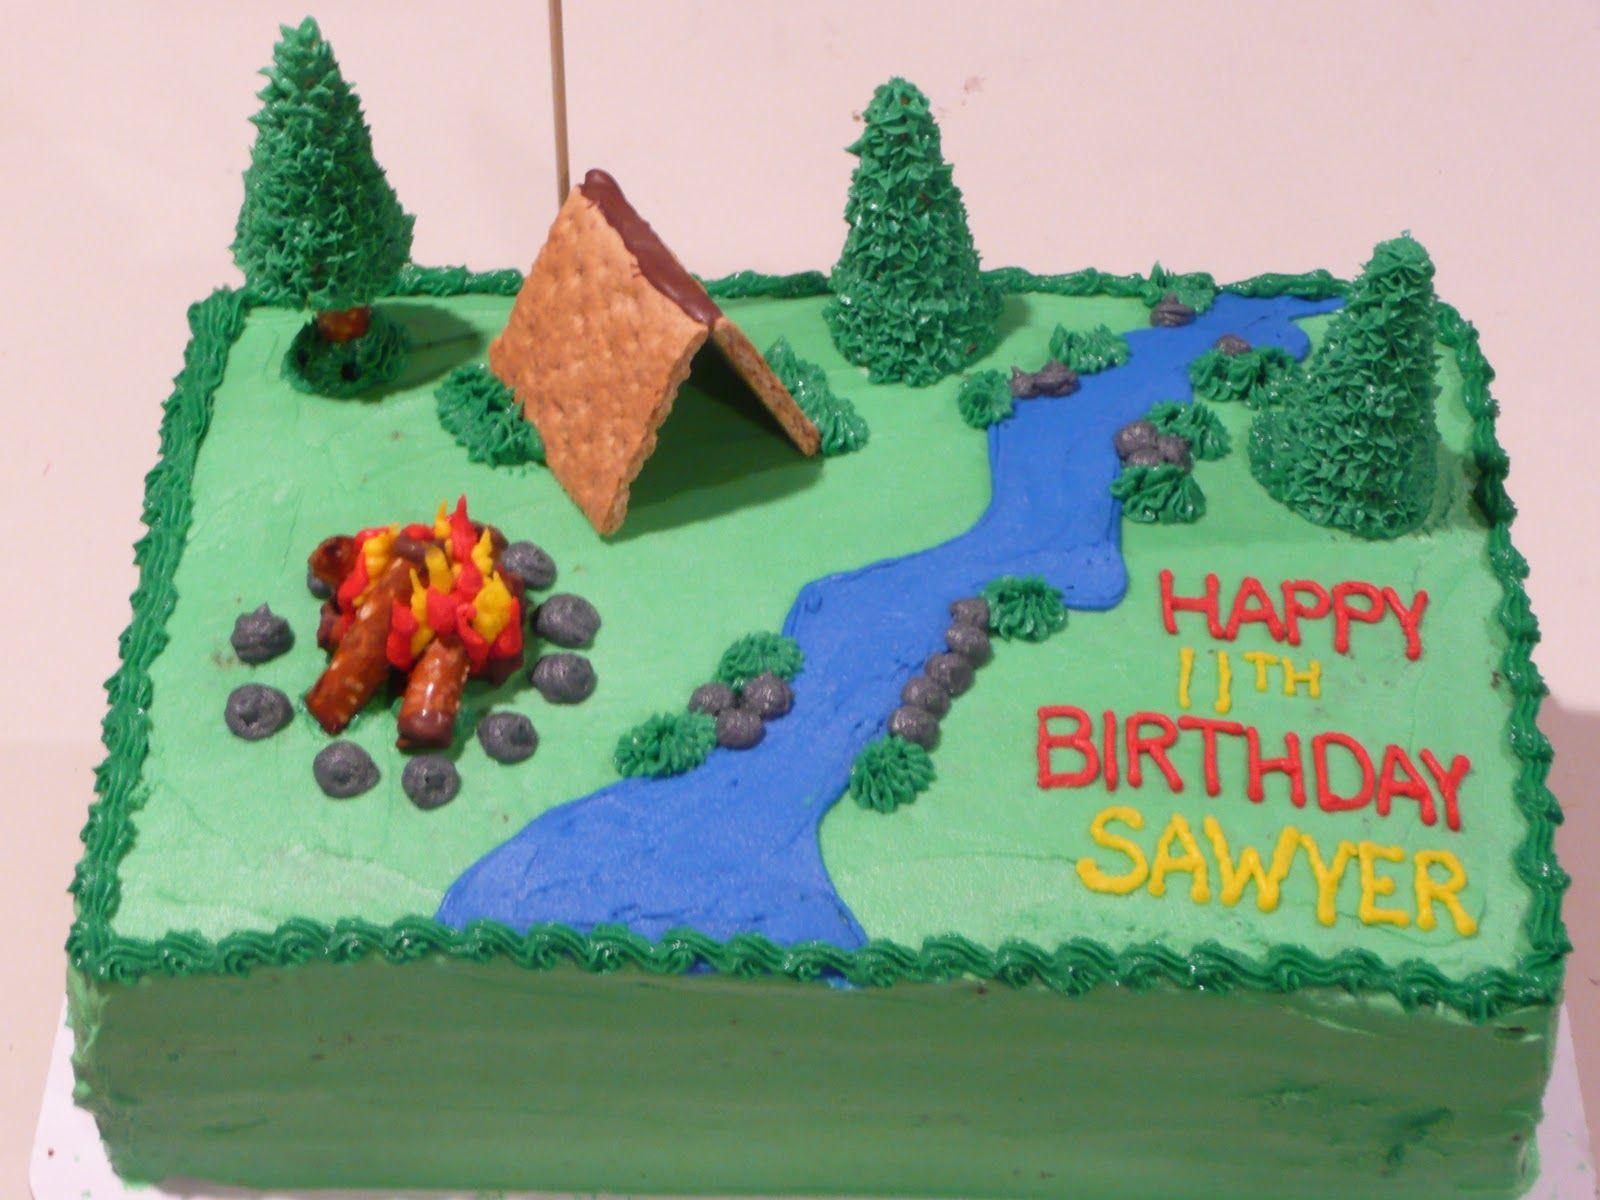 Boy Scout Cakes Designs